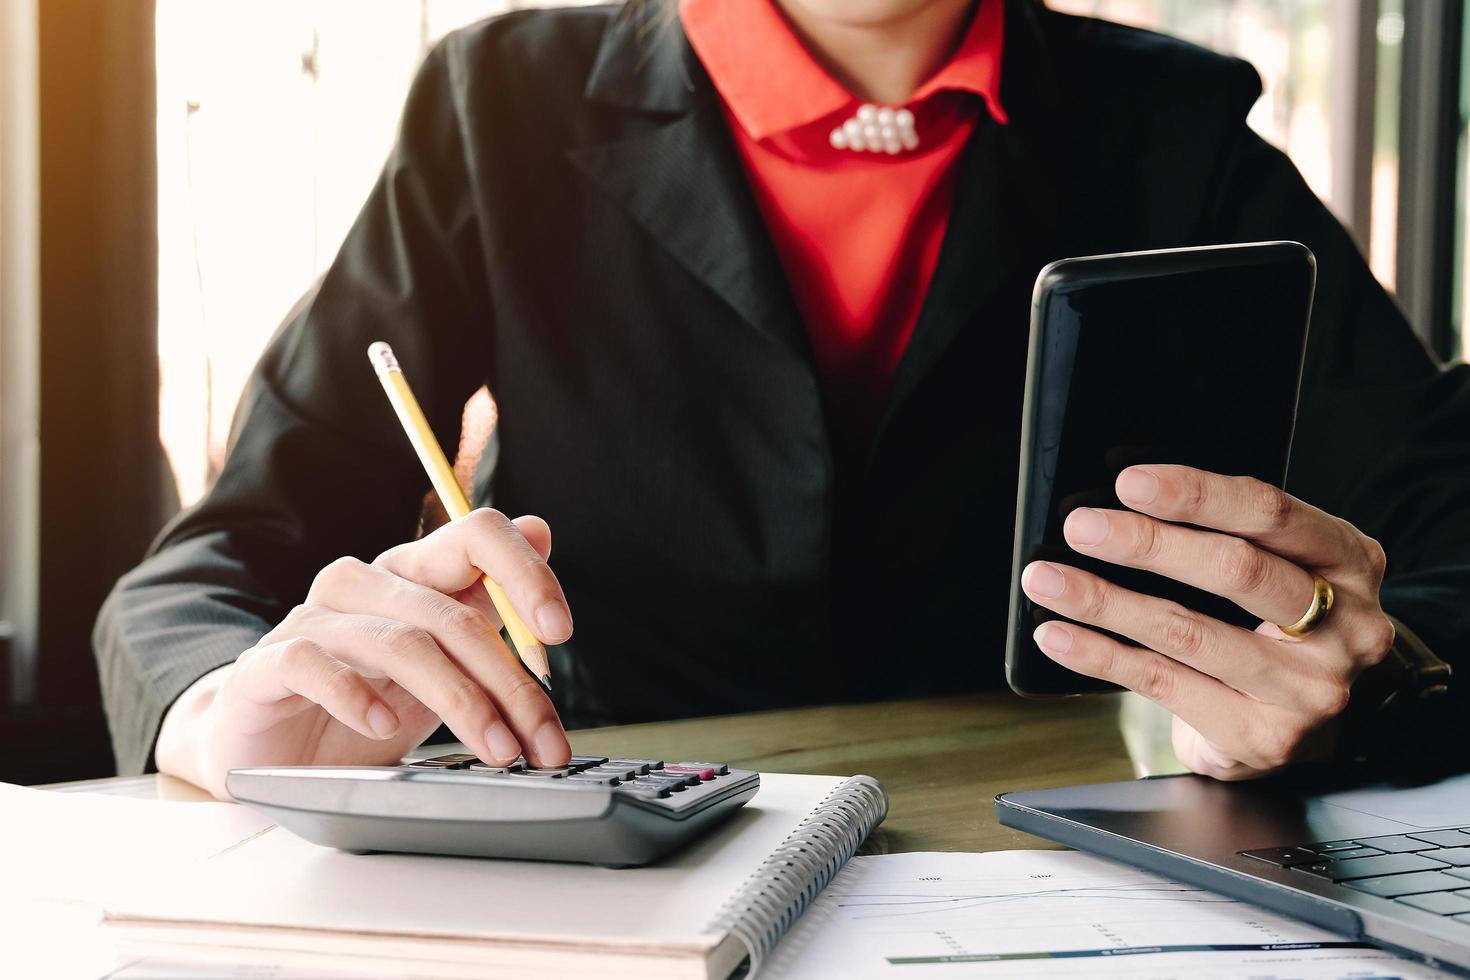 femme affaires, regarder, smartphone, utilisation, calculatrice photo